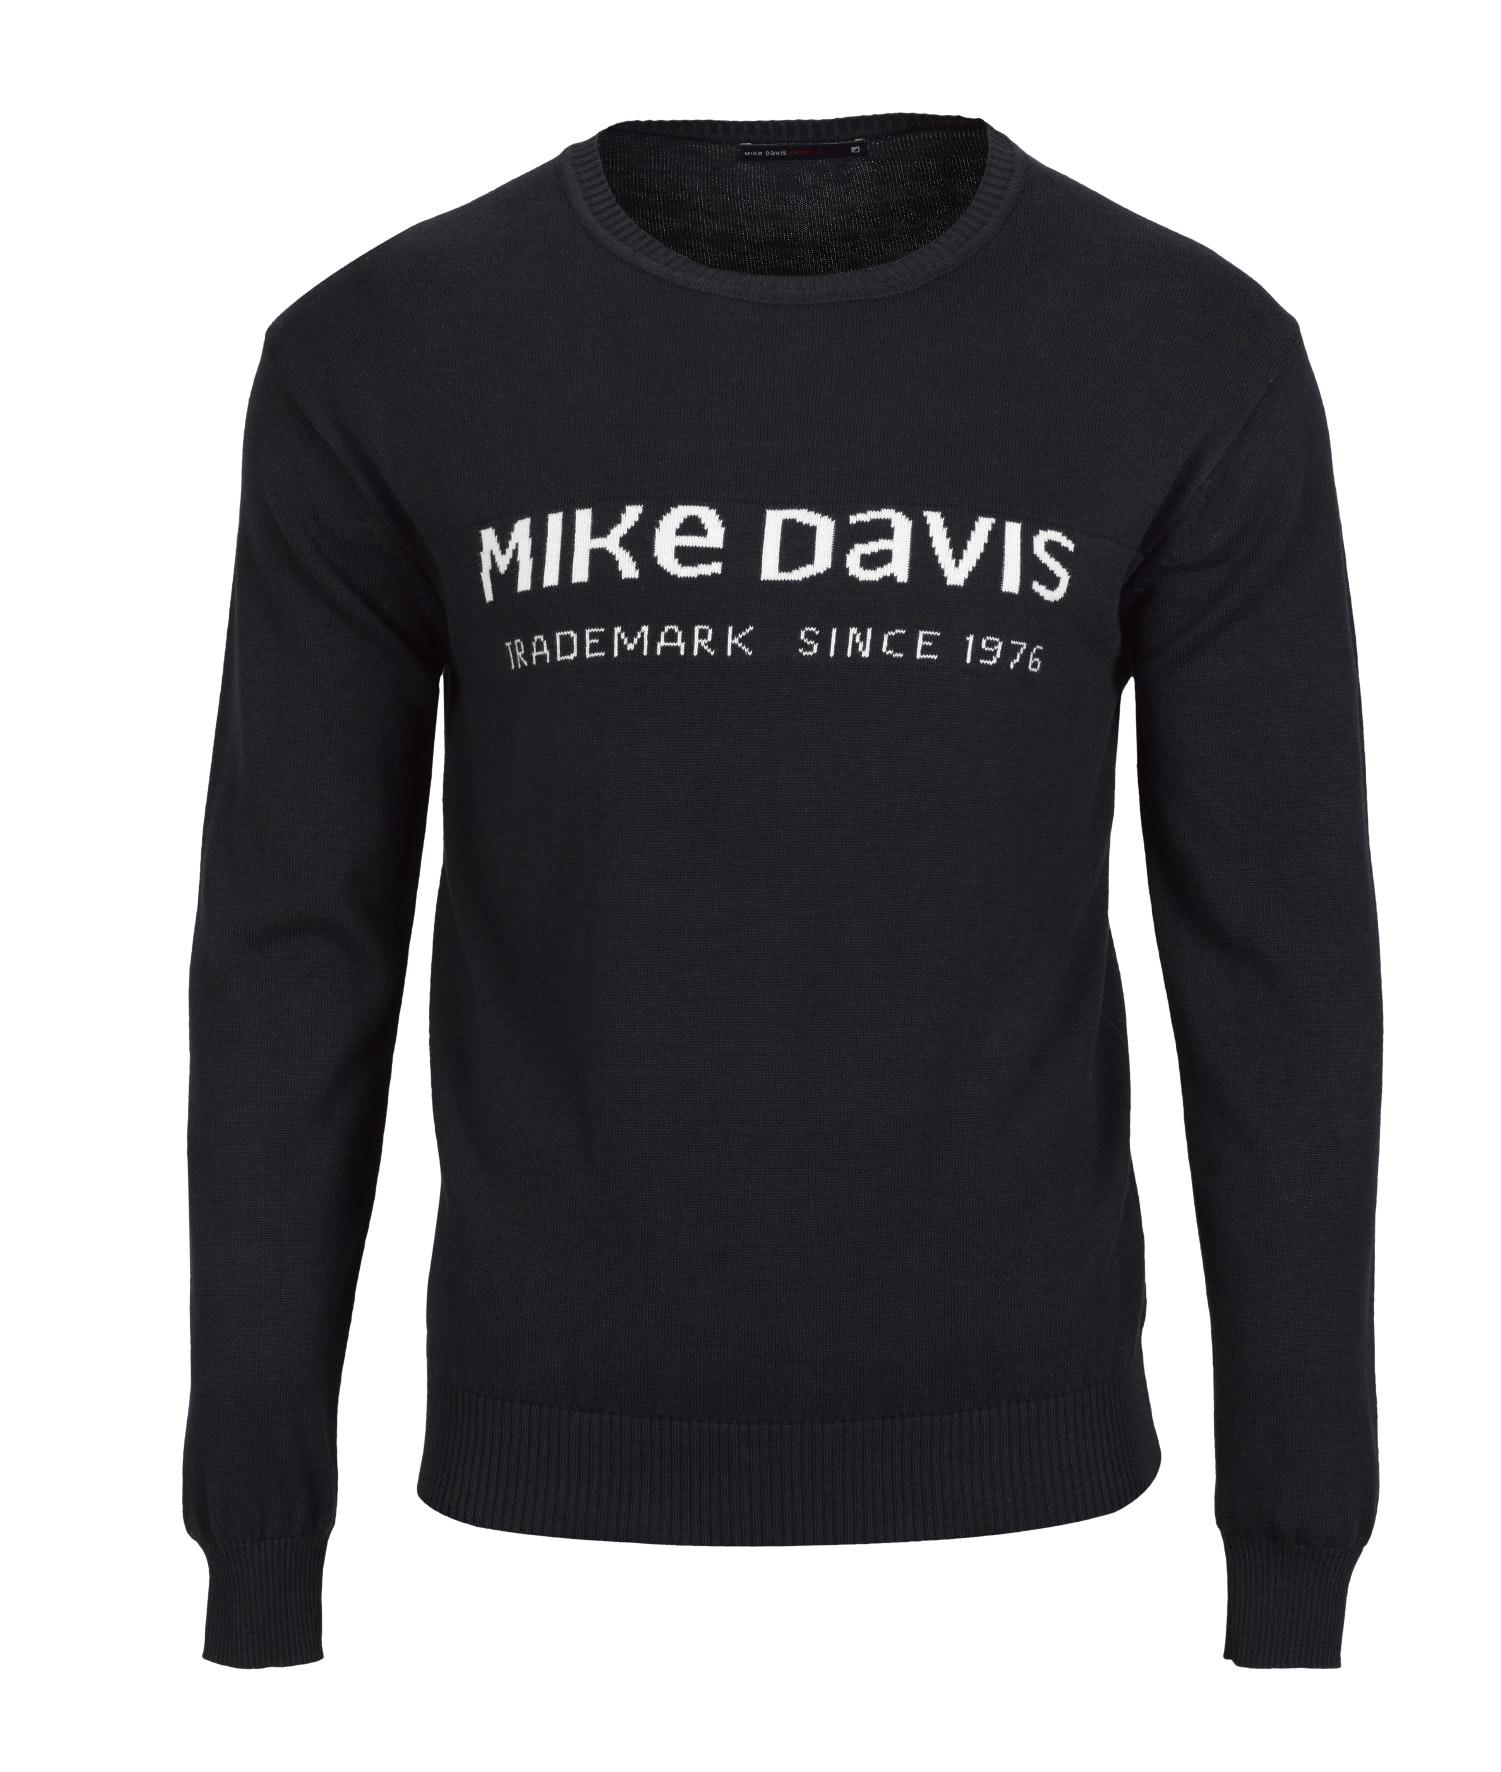 Camisola, Mike Davis, 99,90€